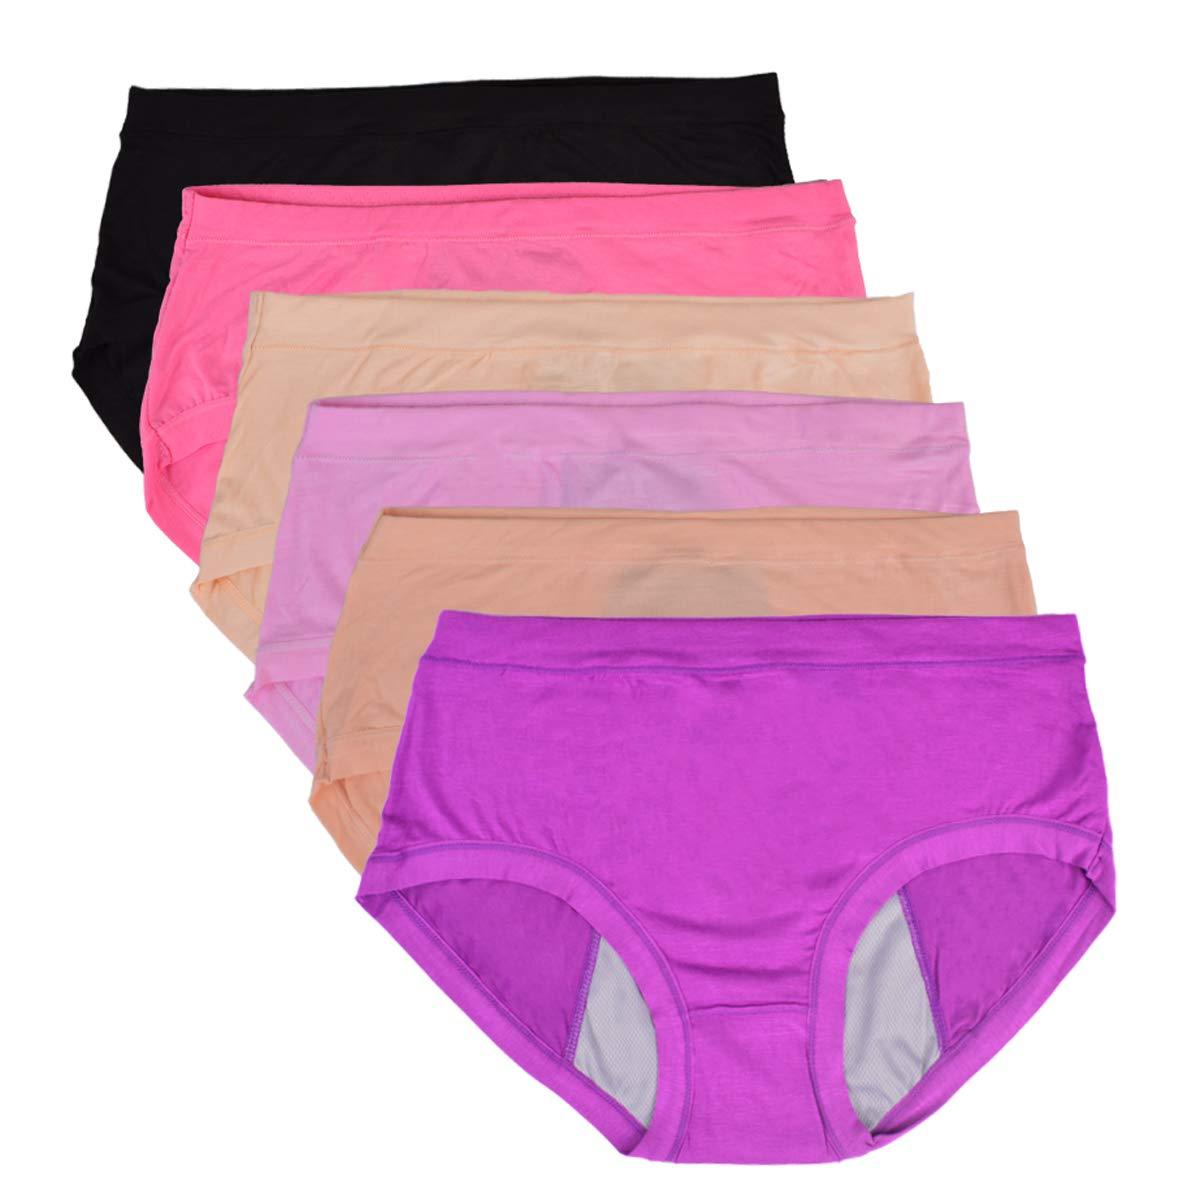 Bolivelan 6 Pack Women's Leakproof Briefs Mid-Rise Bamboo Fiber Panties